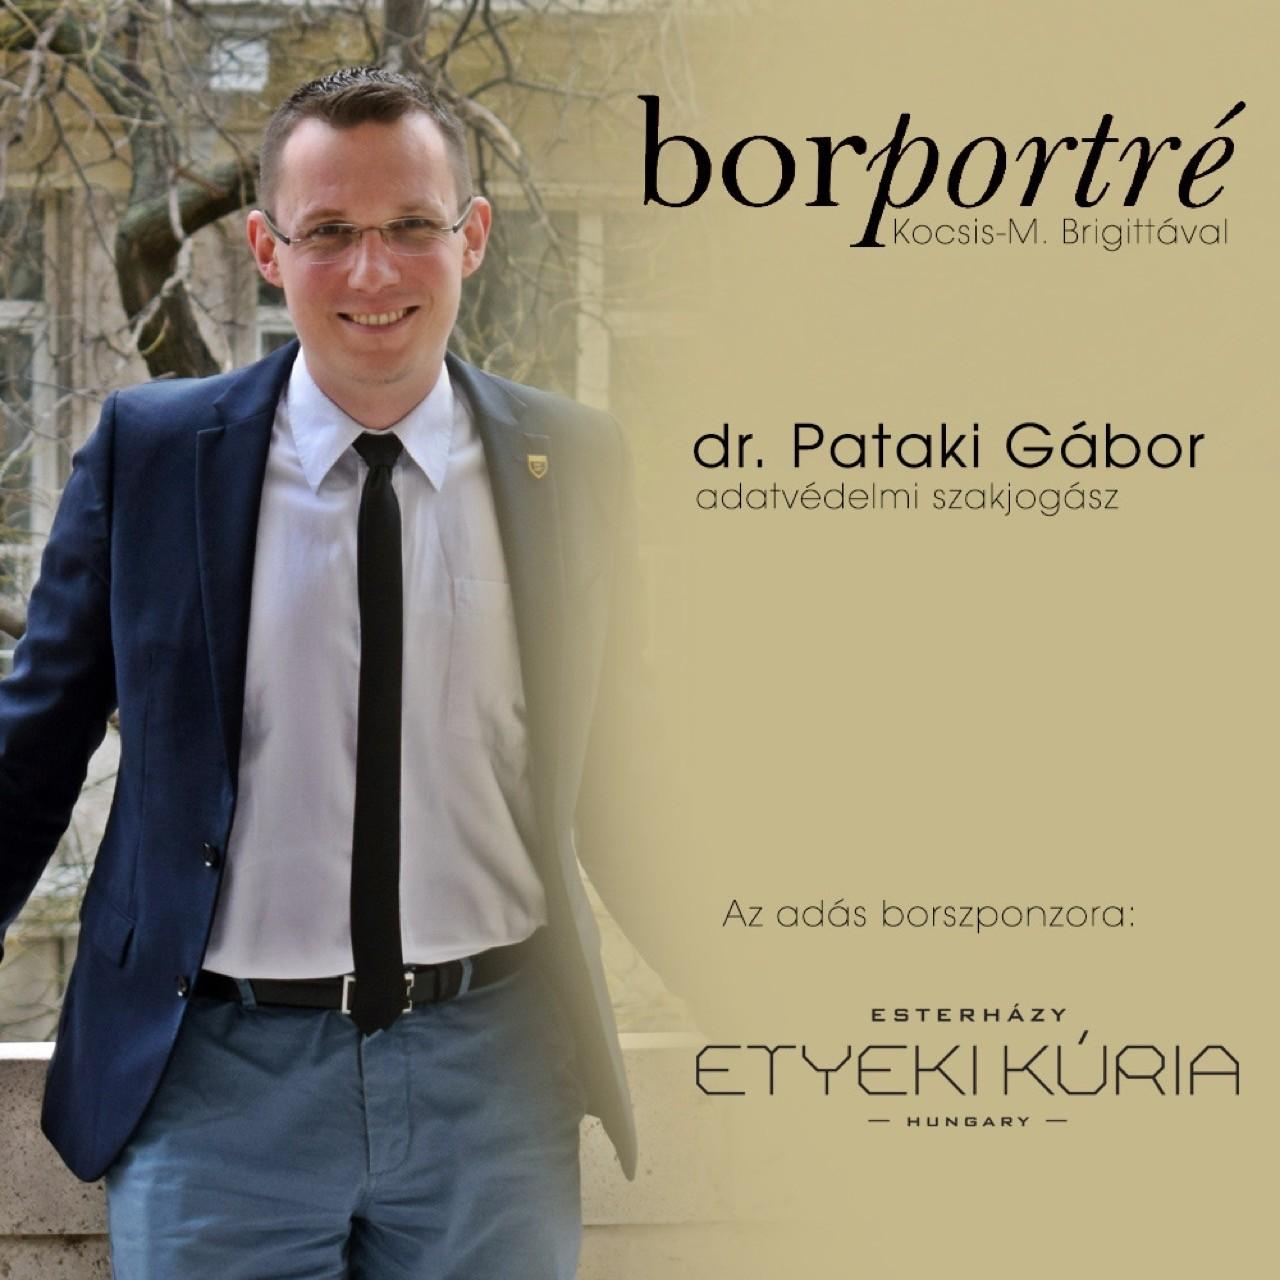 borportre_2020_11_18_dr_pataki_gabor_adatvedelmi_szakjogasz_etyeki_kuria_kocka 2